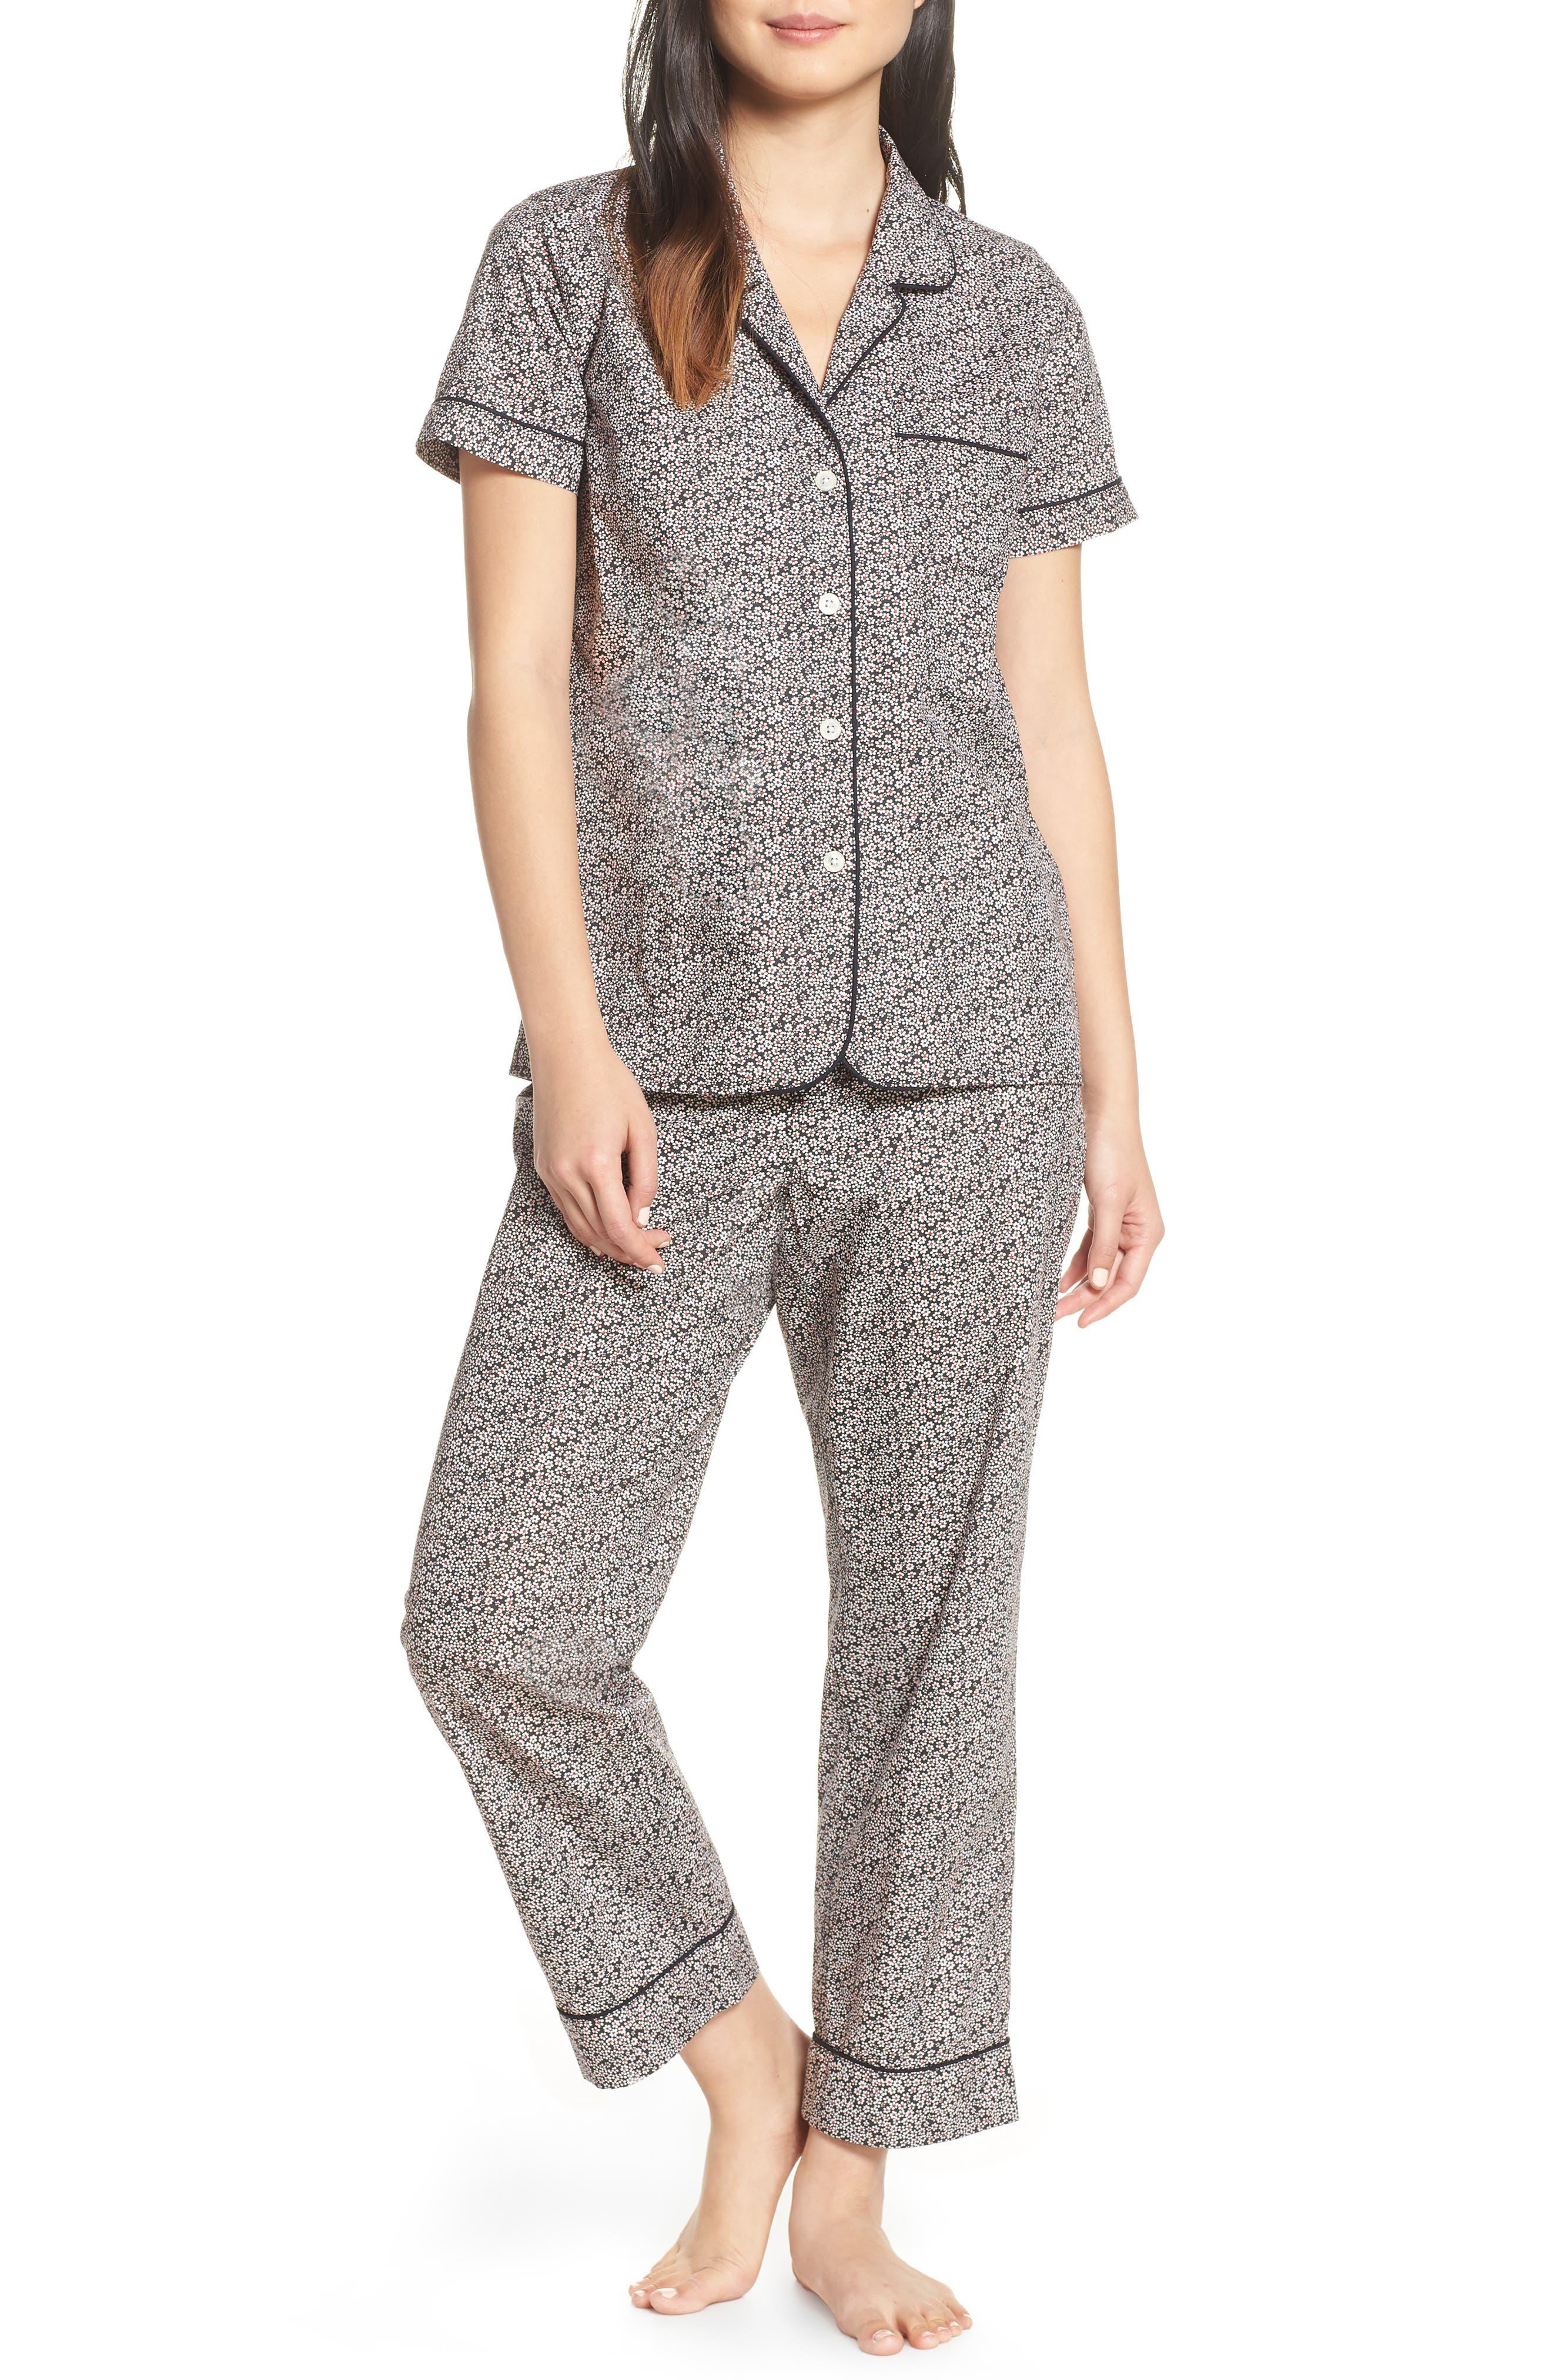 J.crew Ditsy Dot Short Sleeve Pajama Set, Black